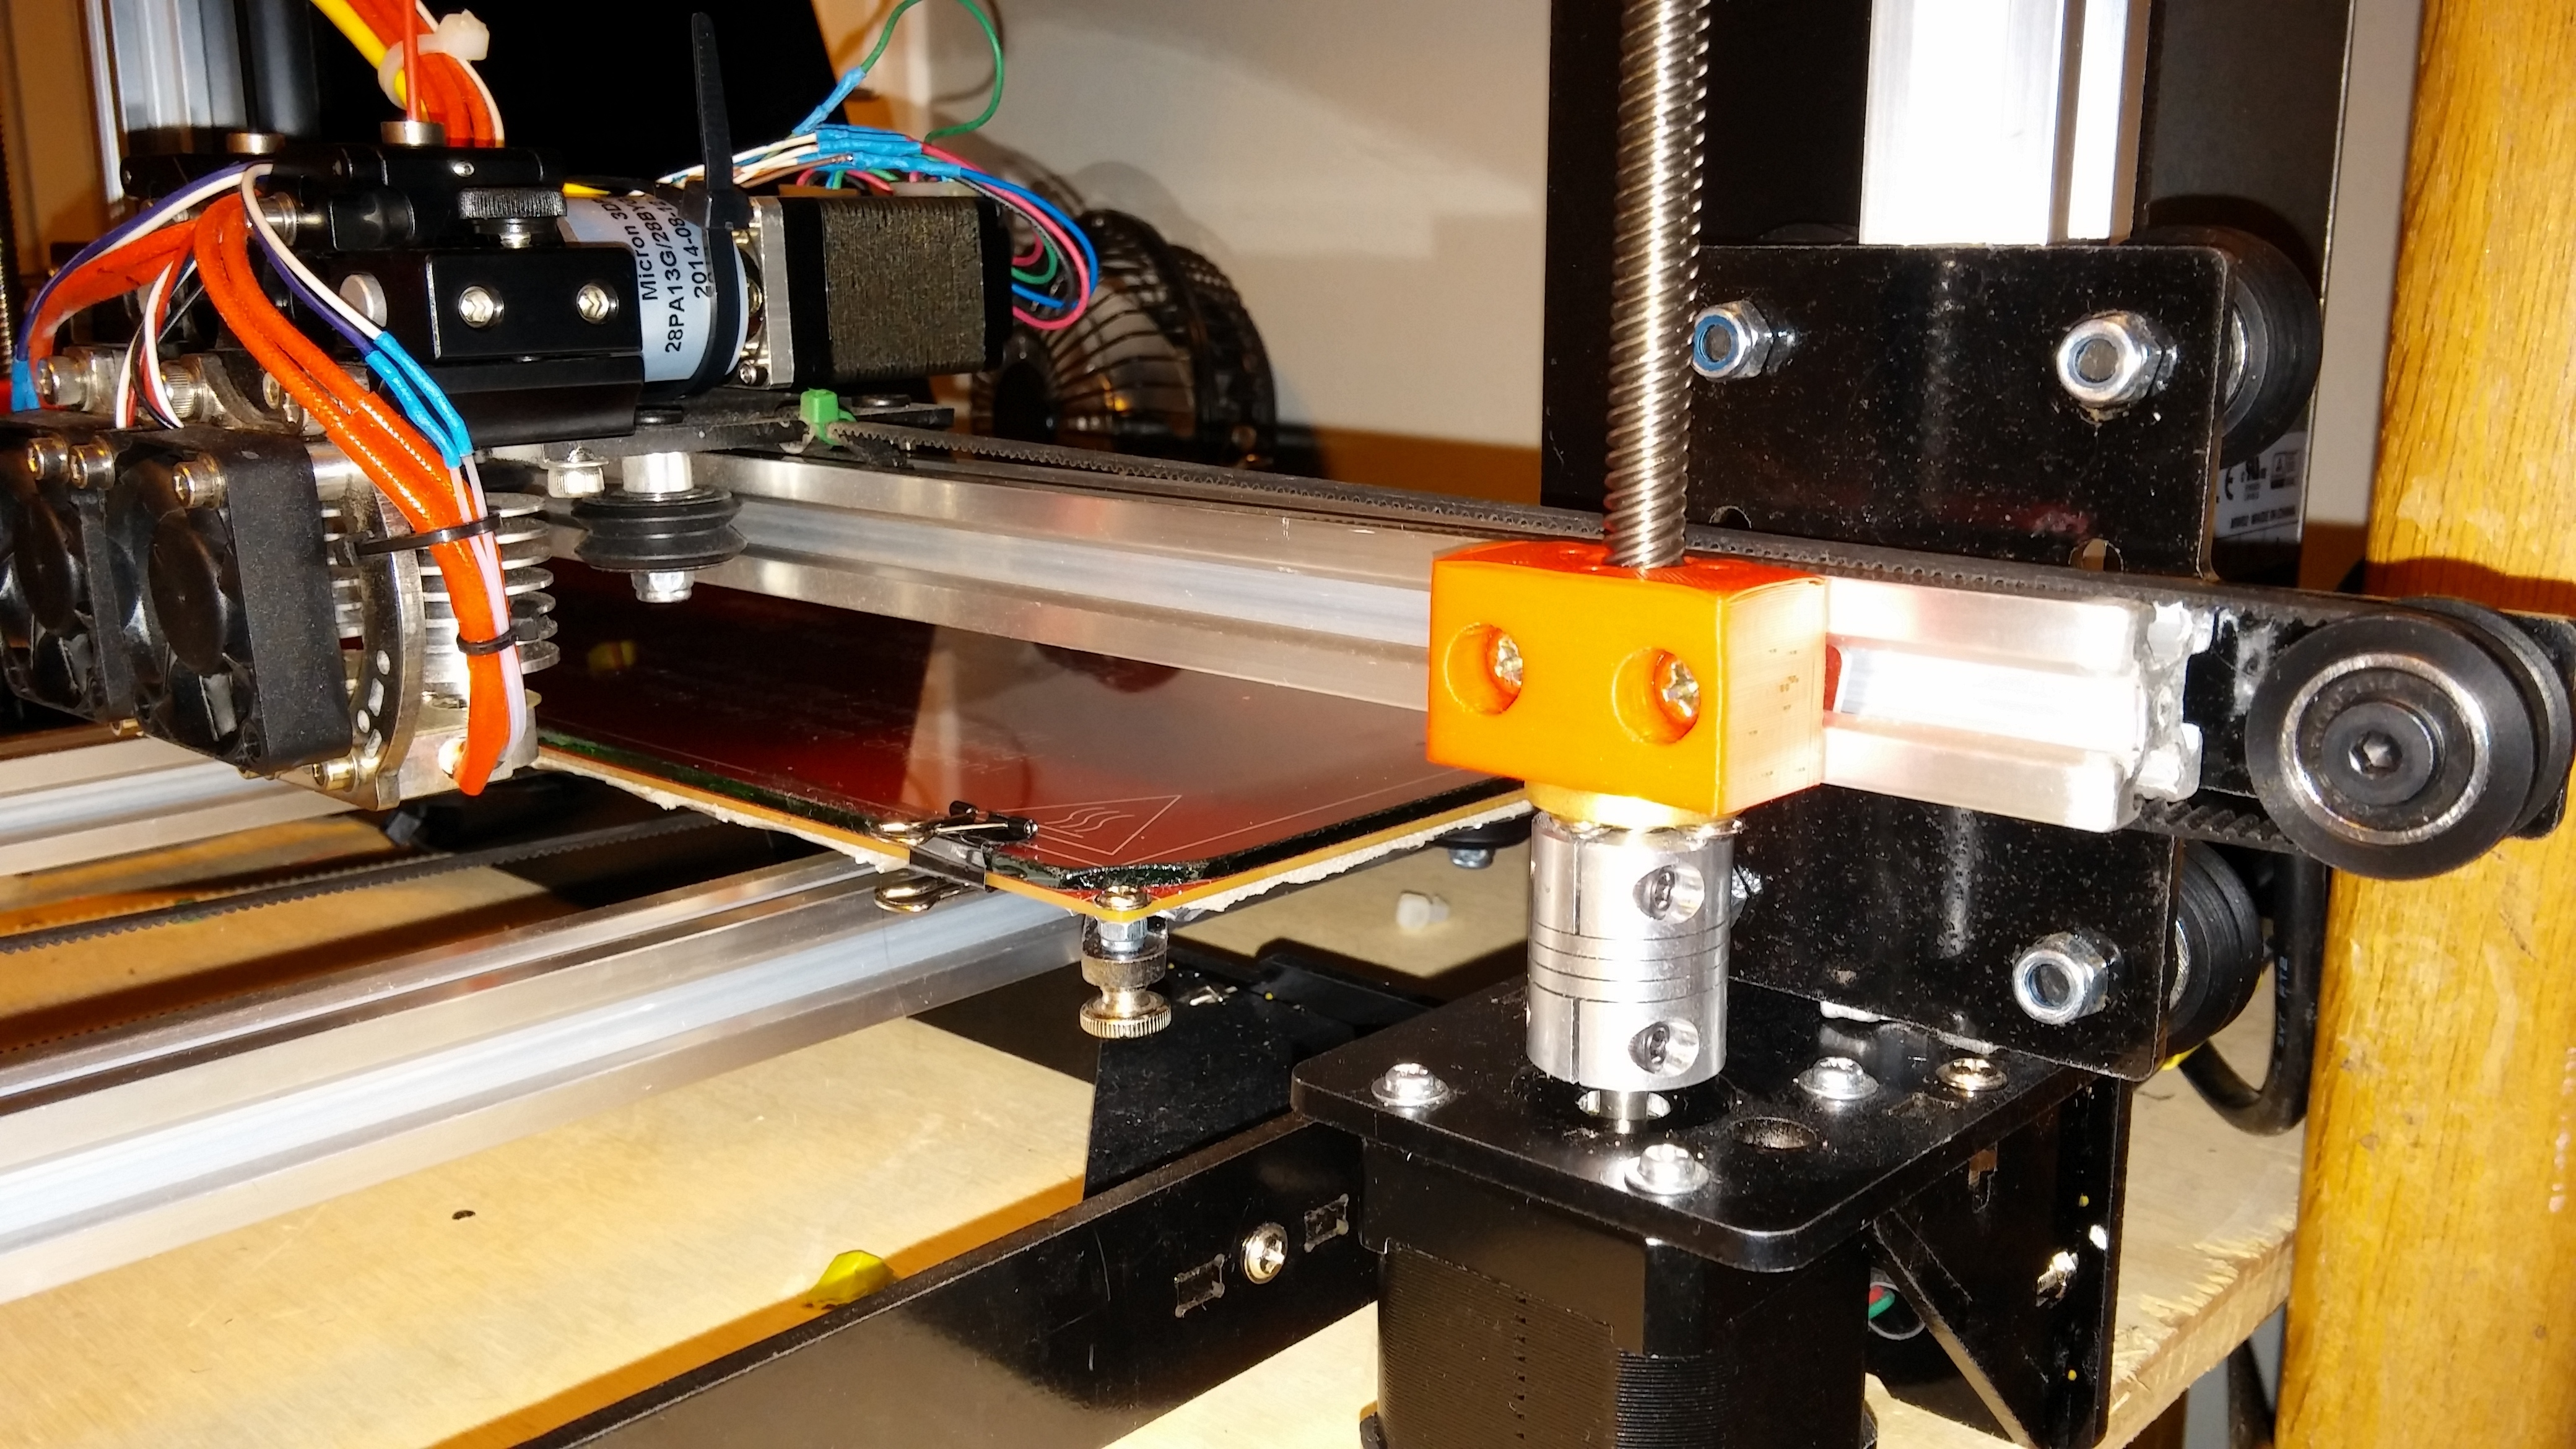 0309151646.jpg Download free STL file NCS P3-v Steel Brass Lead screw mount • 3D print object, trentjw